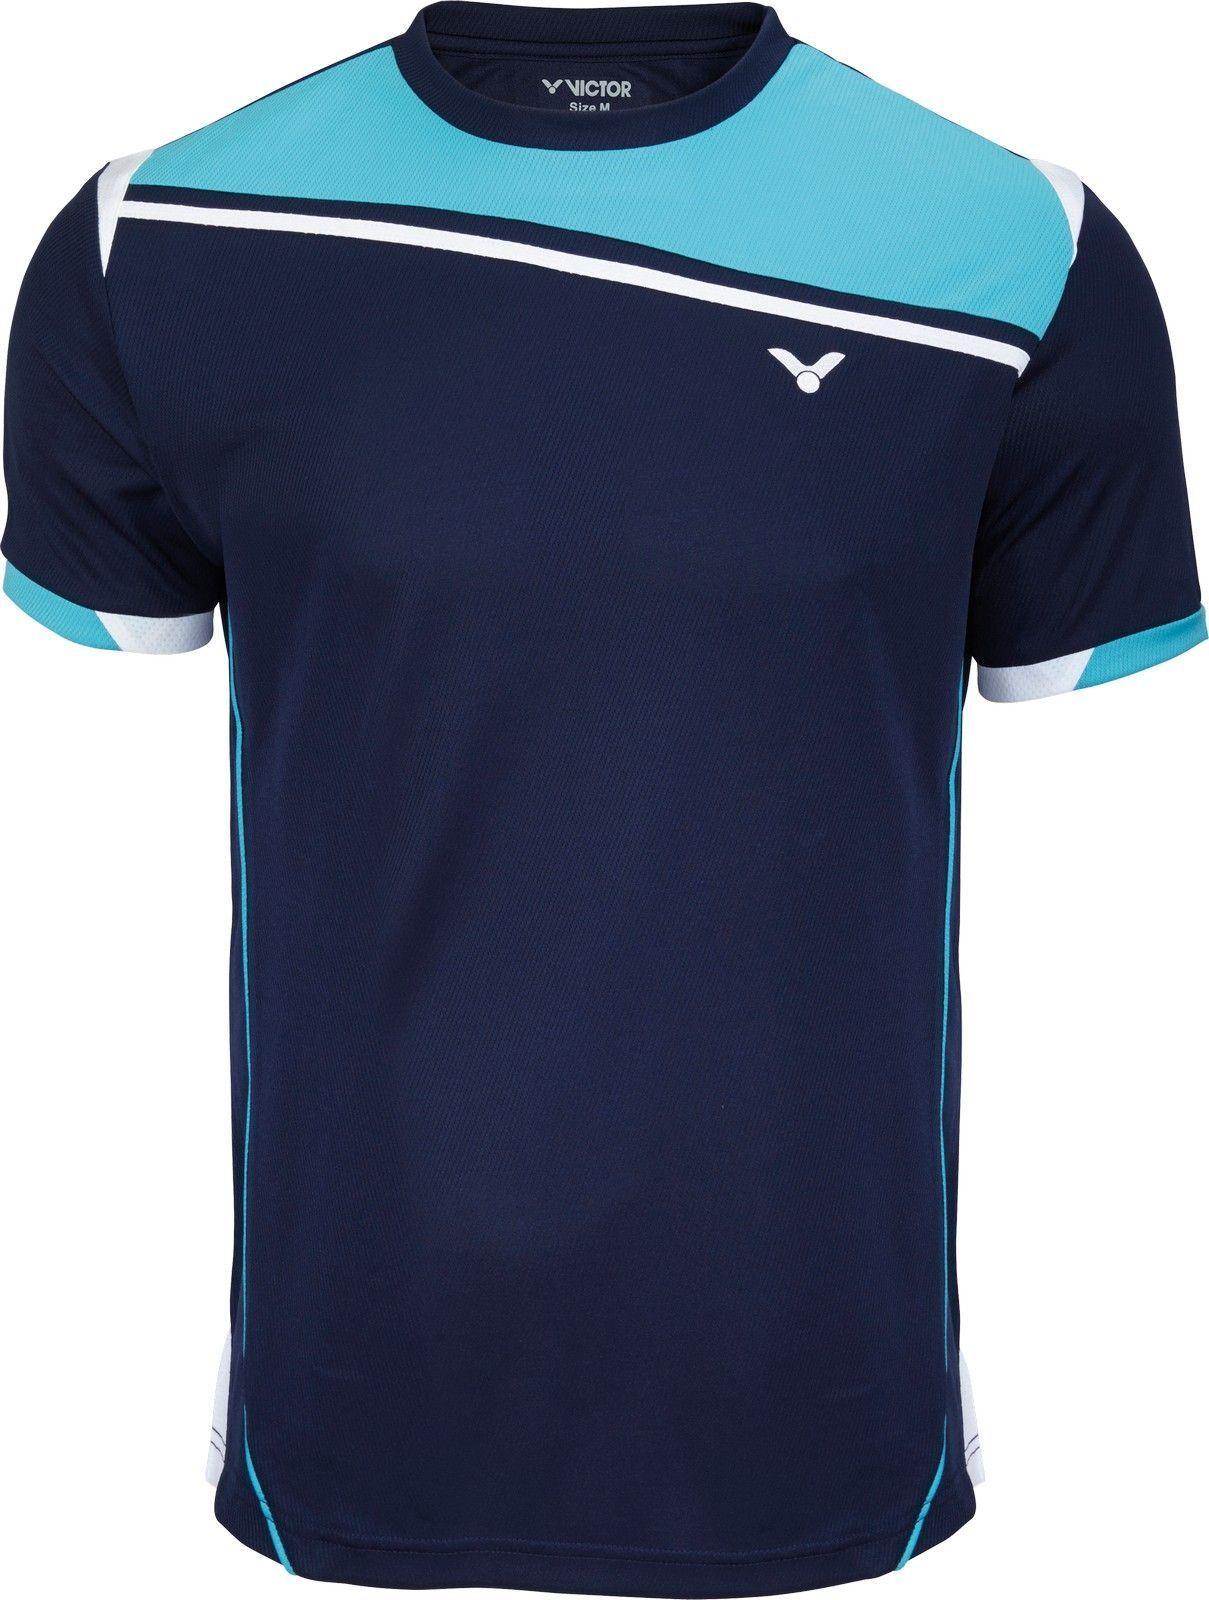 Victor Camiseta Función 6966 2016 Bádminton sizes Para Niños fibra funcional